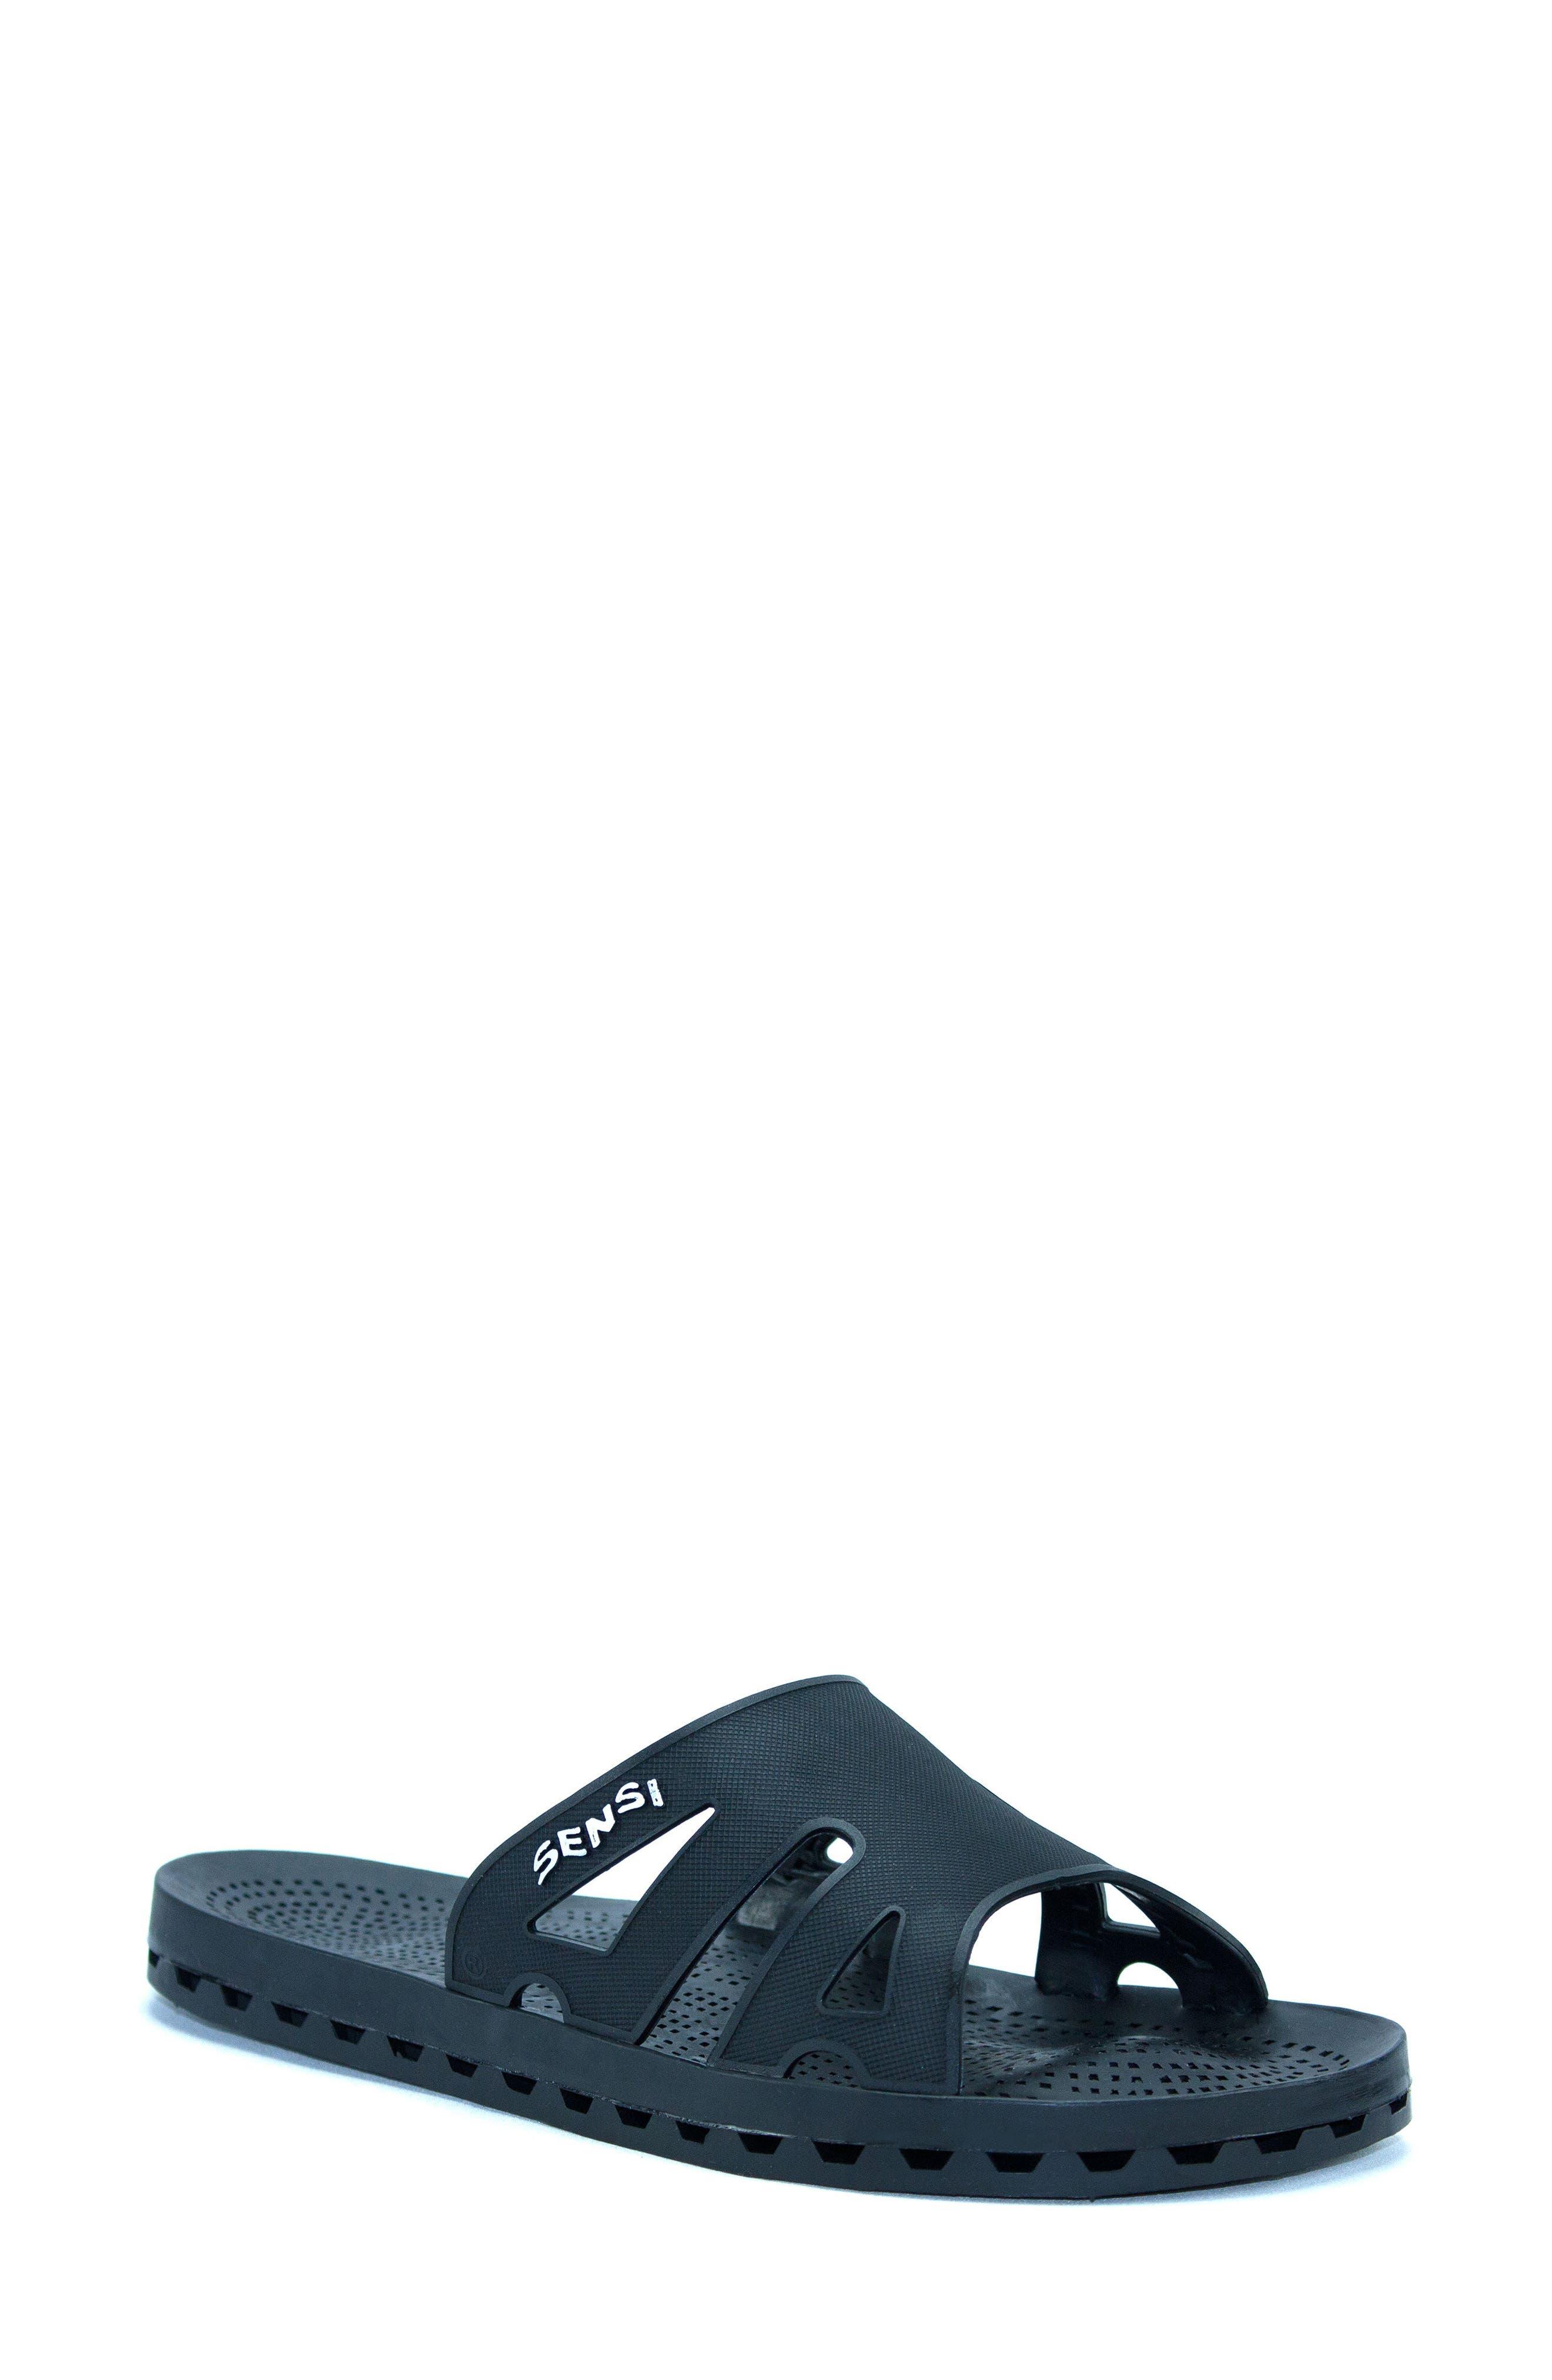 Regatta Slide Sandal,                         Main,                         color, Solid Black Rubber